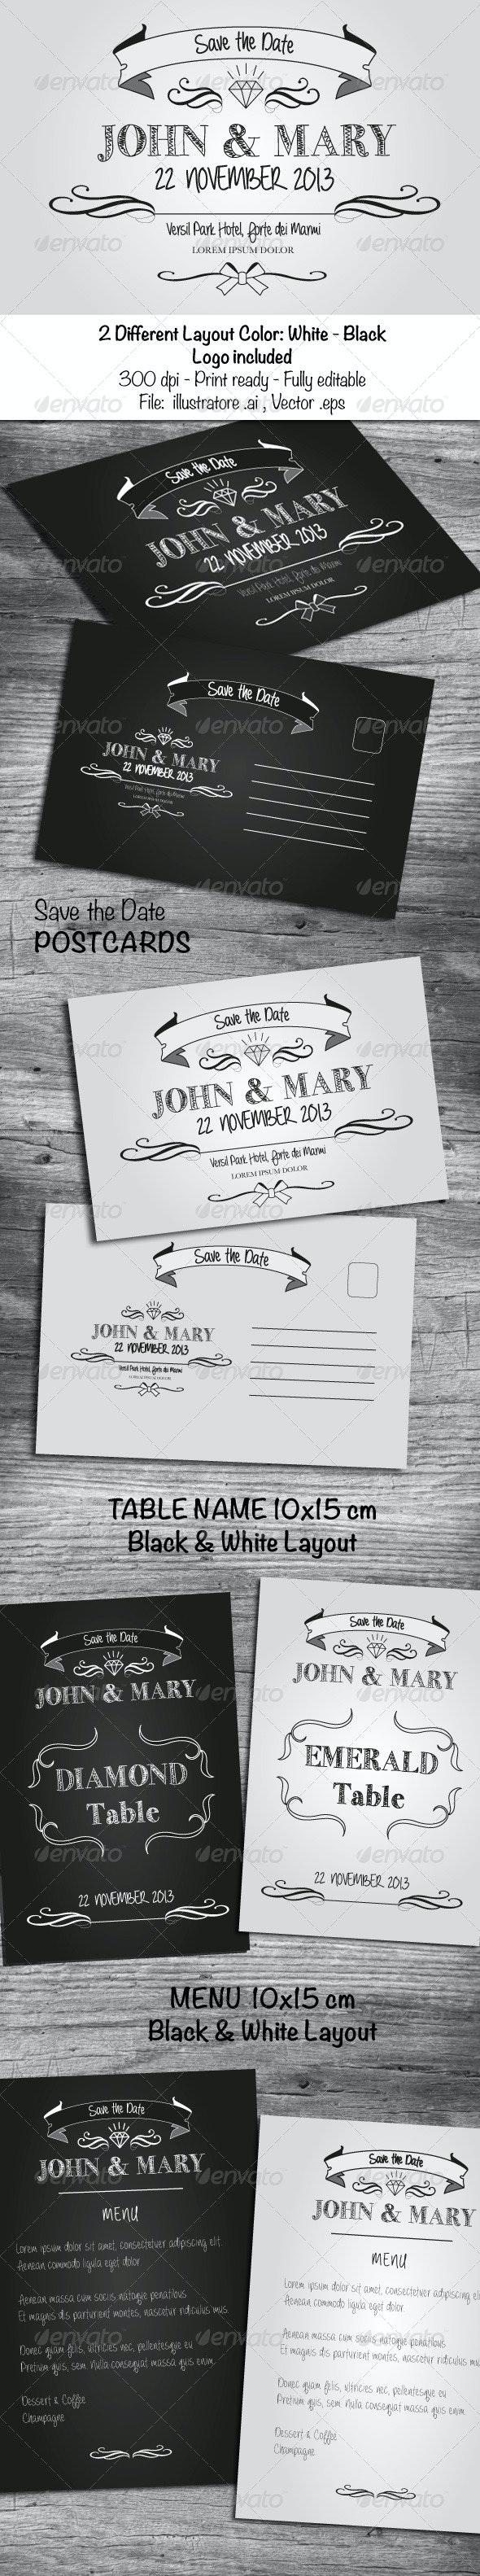 Black & White Wedding Cards - Cards & Invites Print Templates